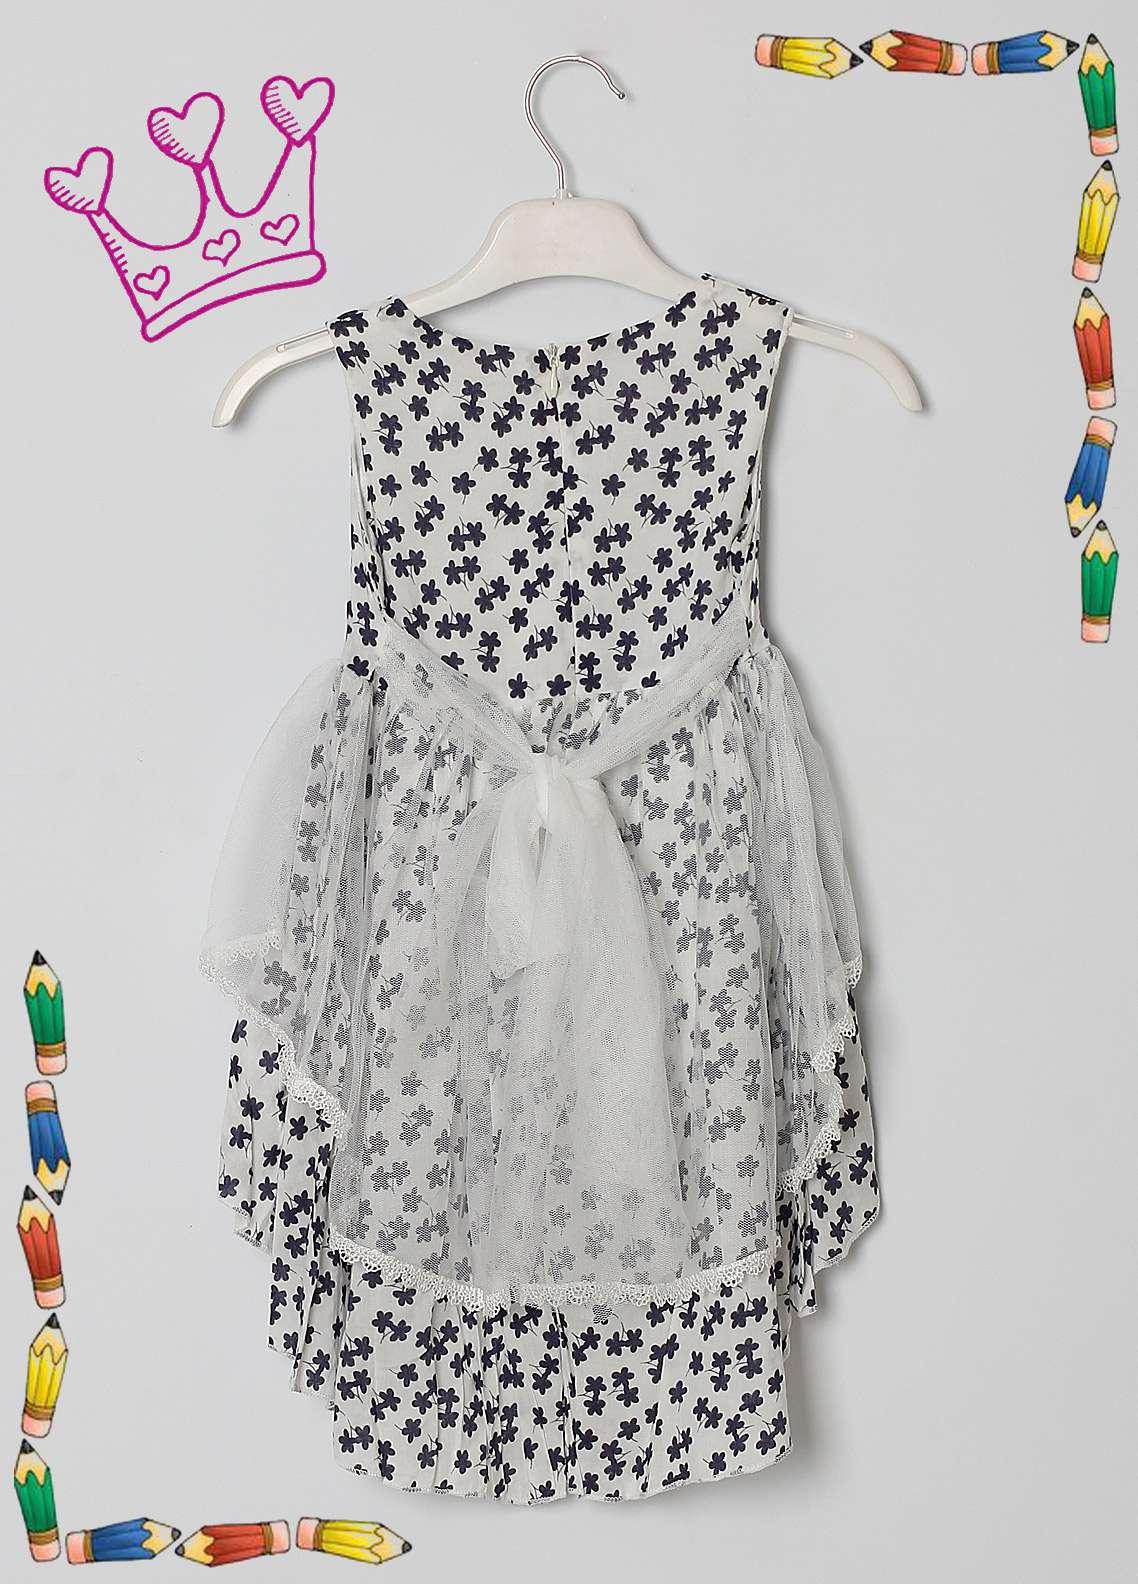 Sanaulla Exclusive Range Cotton Net Fancy Girls Frocks -  5465 White